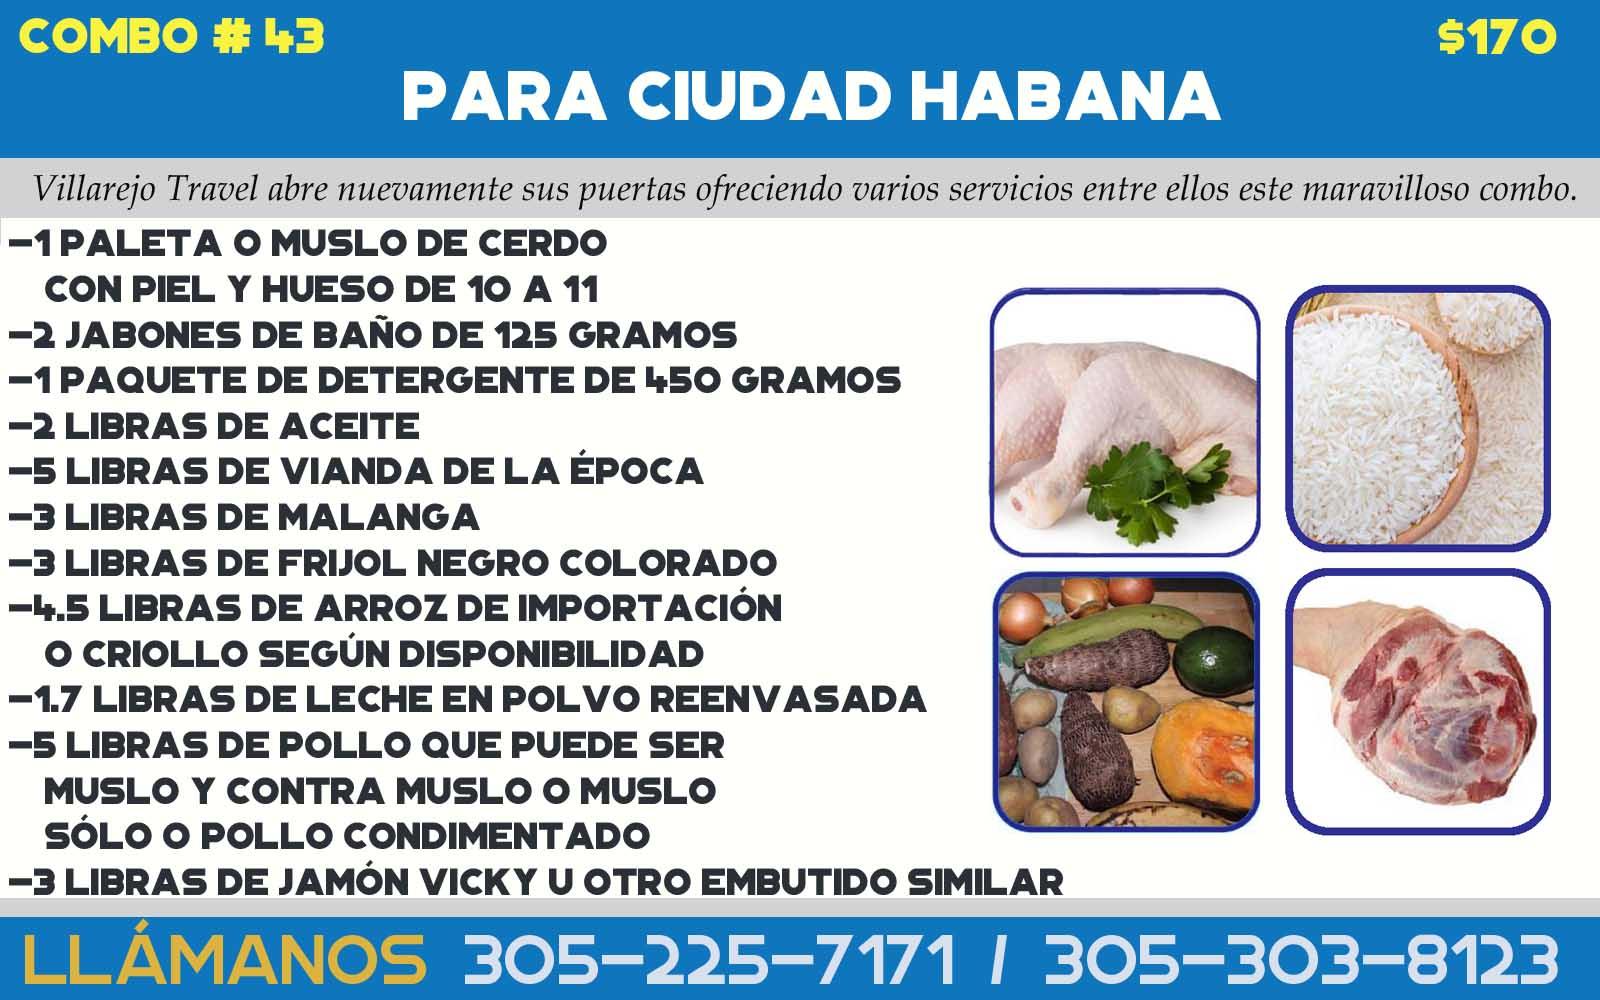 COMBO  # 43  PARA CIUDAD HABANA  $ 170